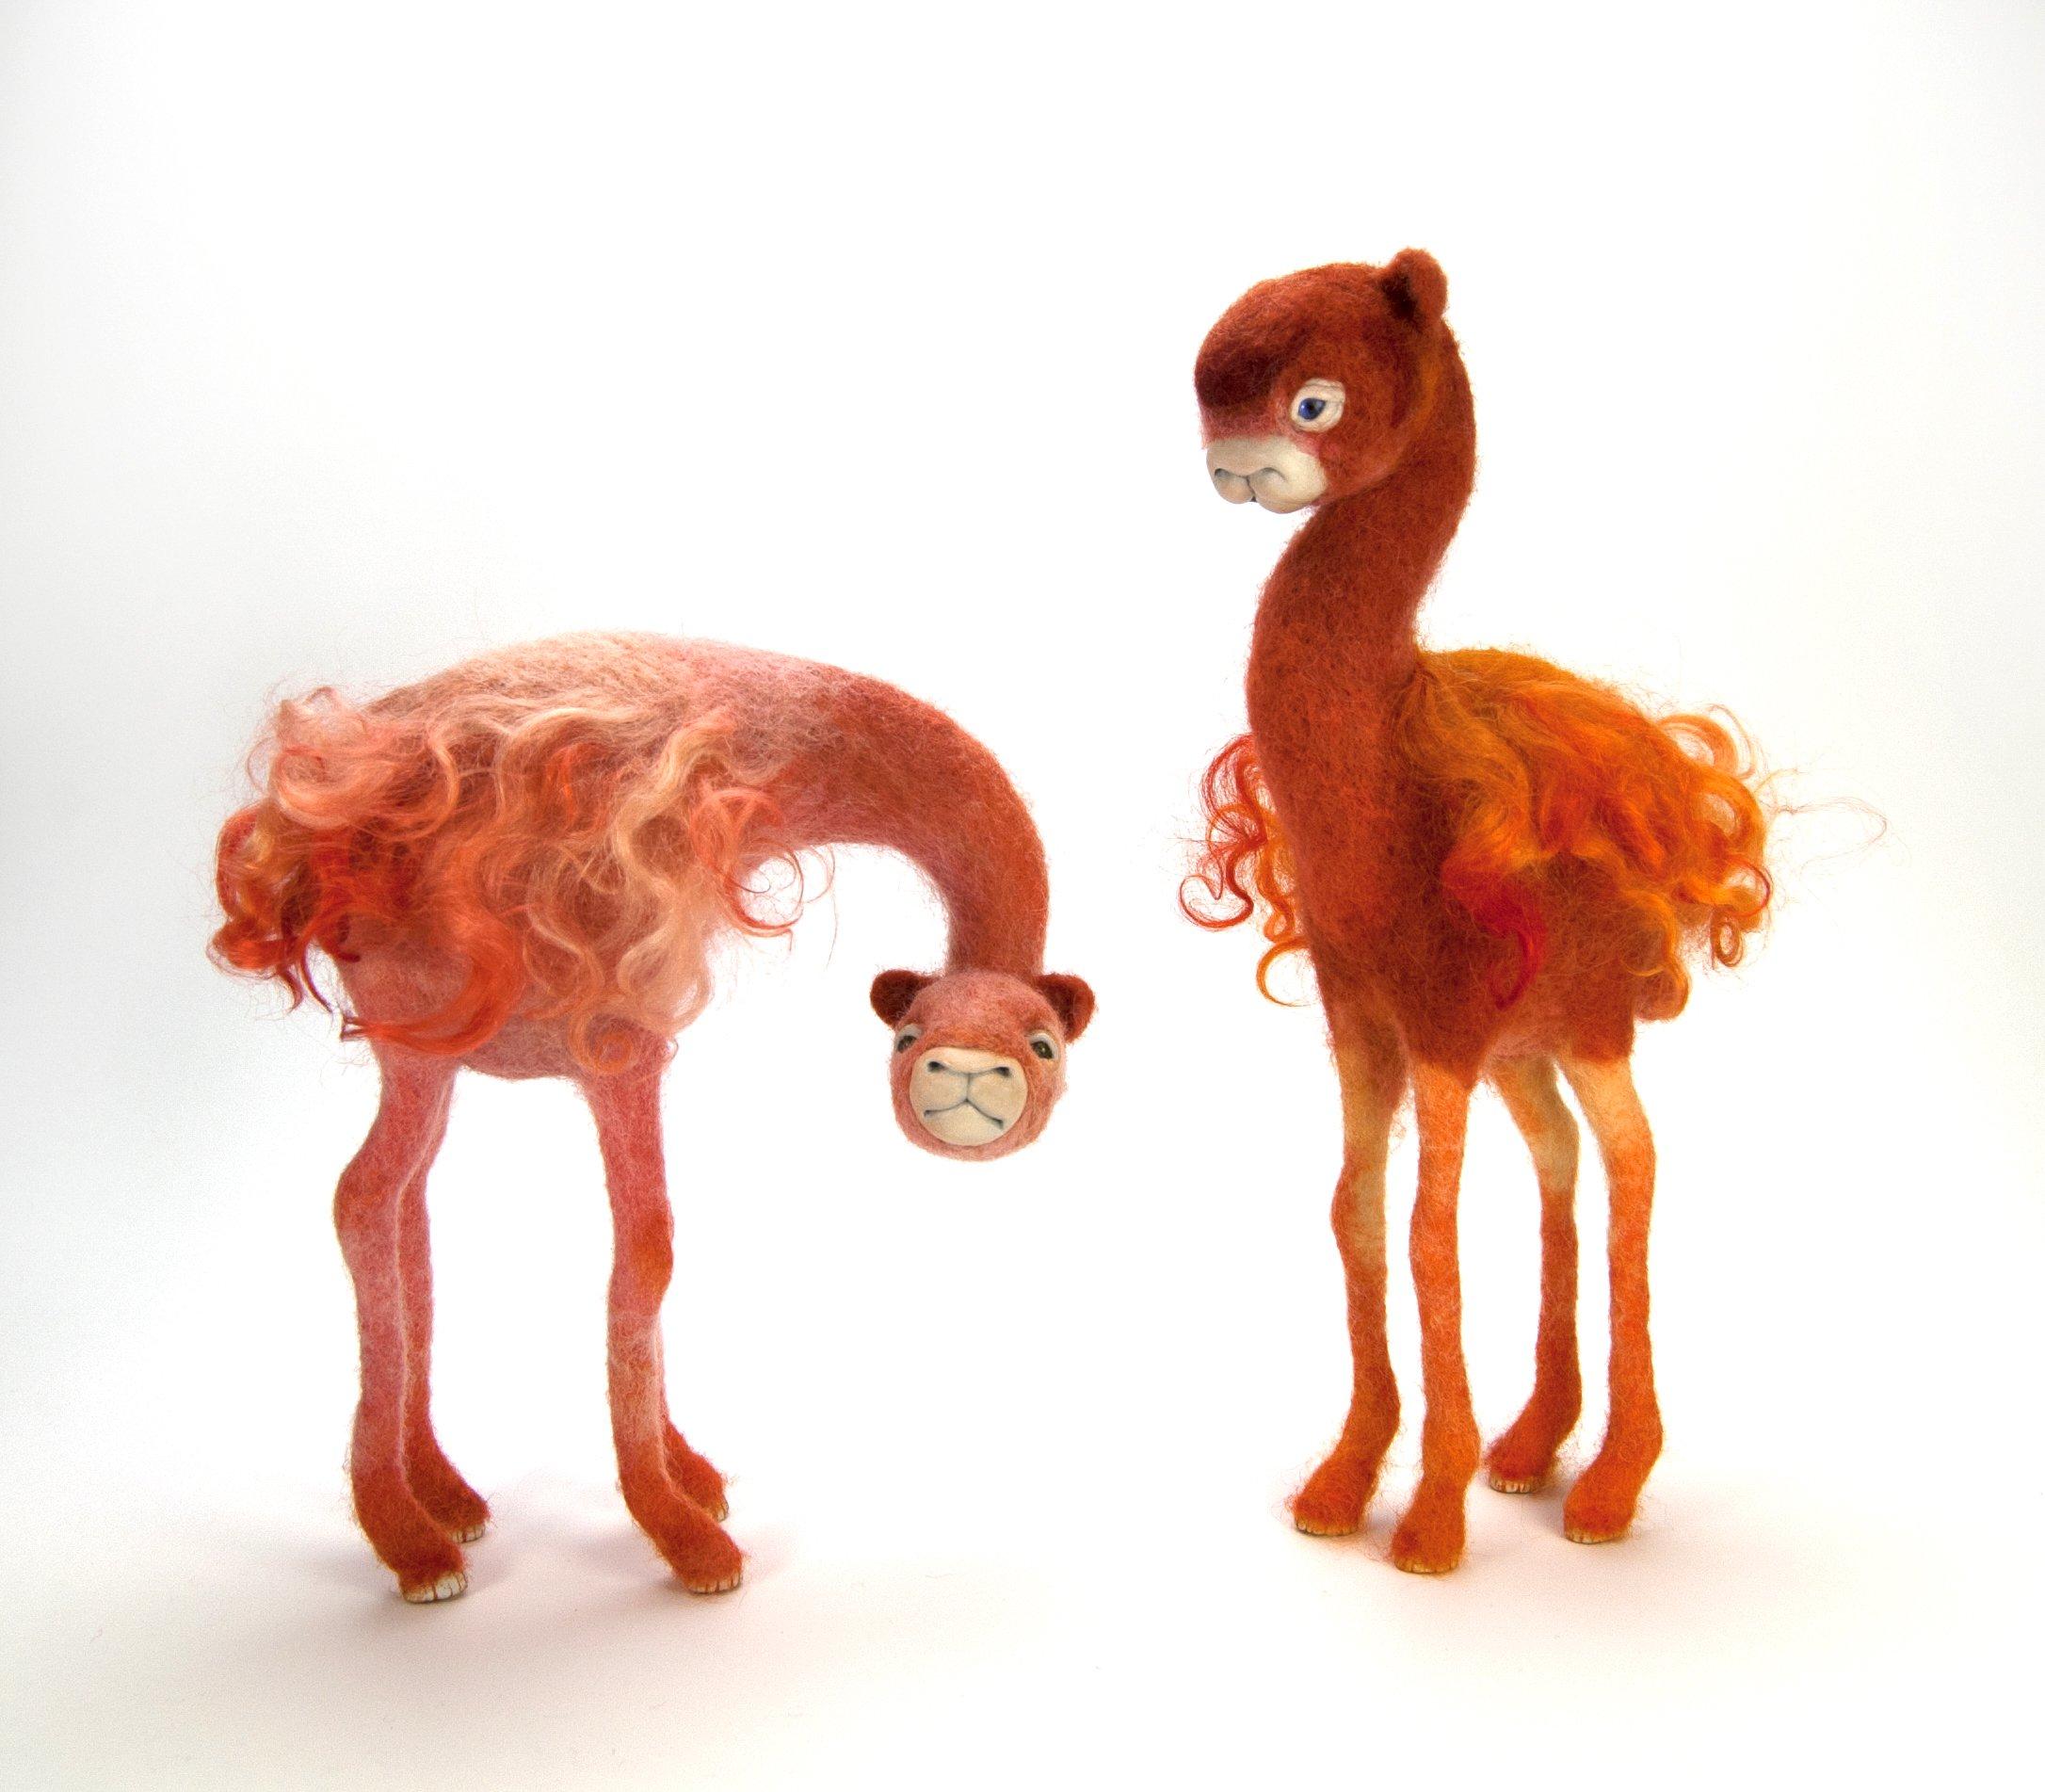 Needle Felt and Mixed Media animal sculptures